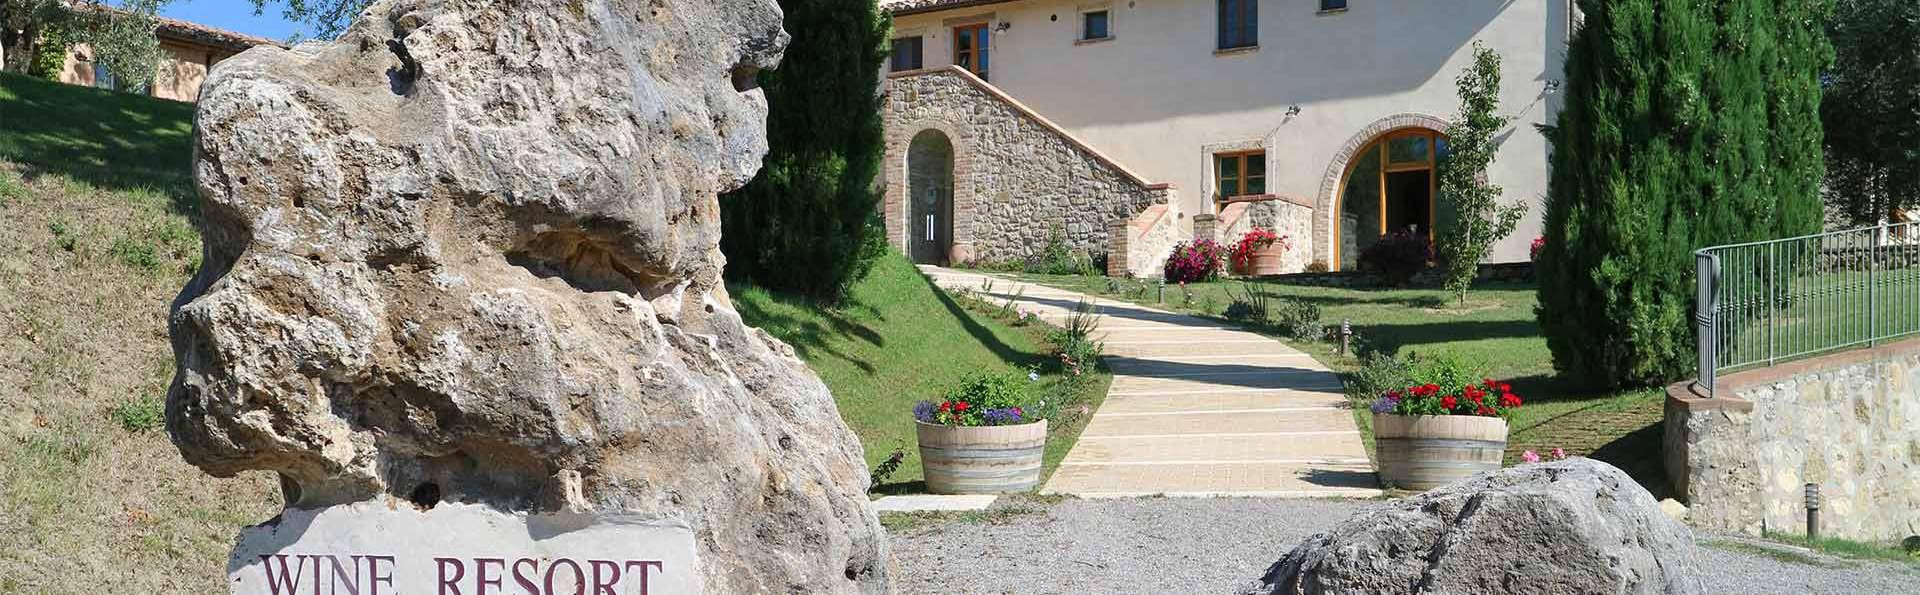 Le Buche Wine Resort & Spa - EDIT_EXTERIOR_01.jpg